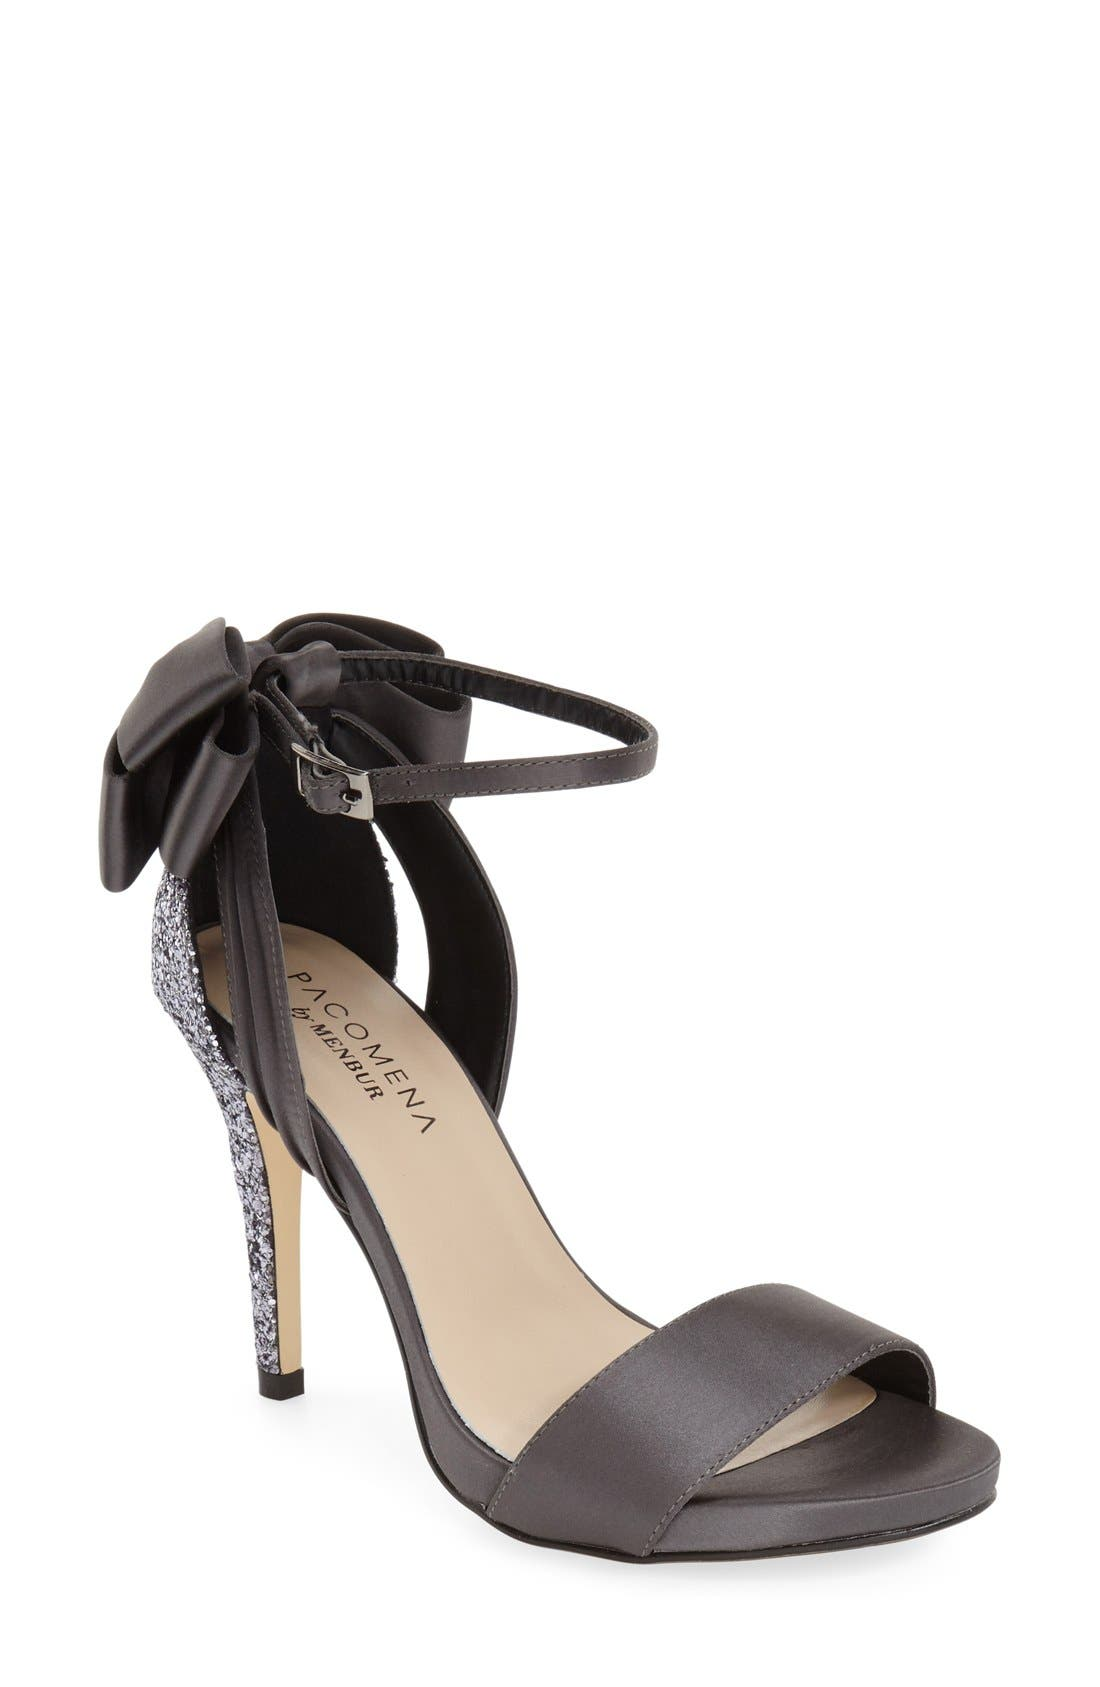 MENBUR 'Clarin' Bow Ankle Strap Sandal